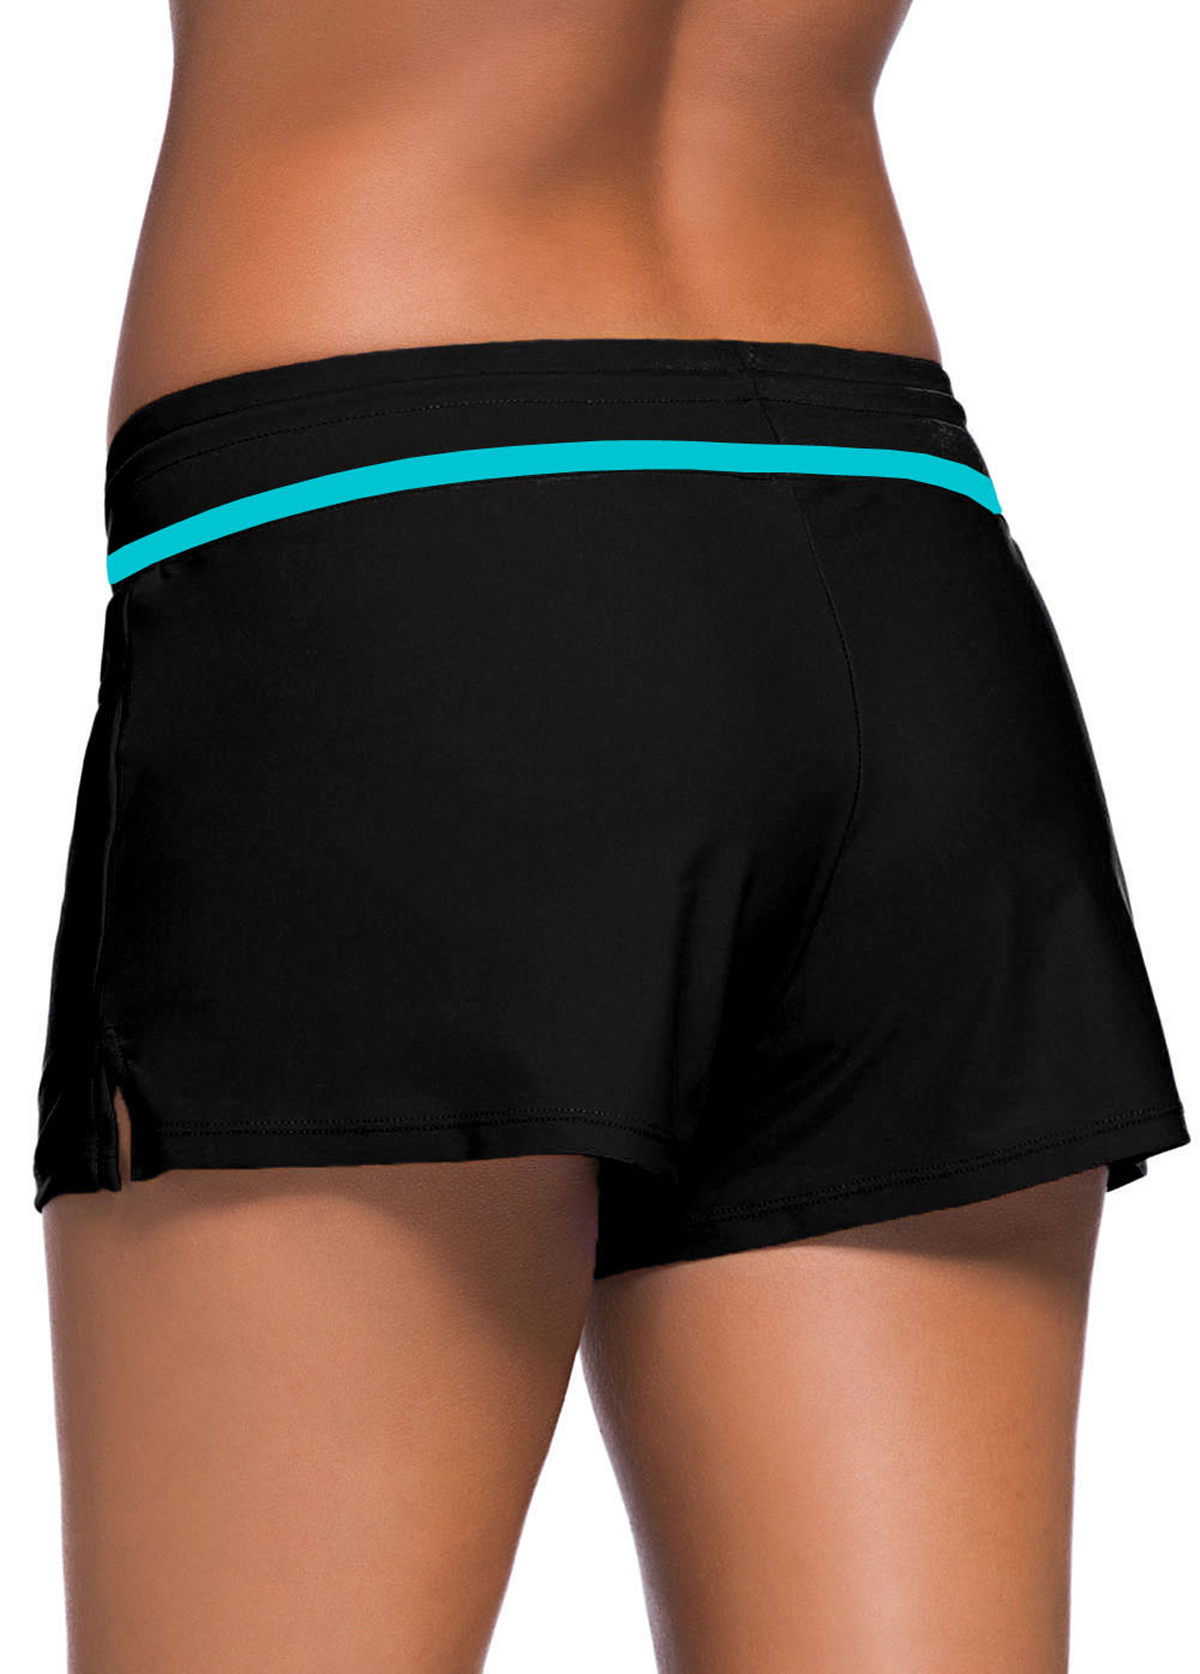 Contrast Bowknot Piping Detail Swimwear Shorts